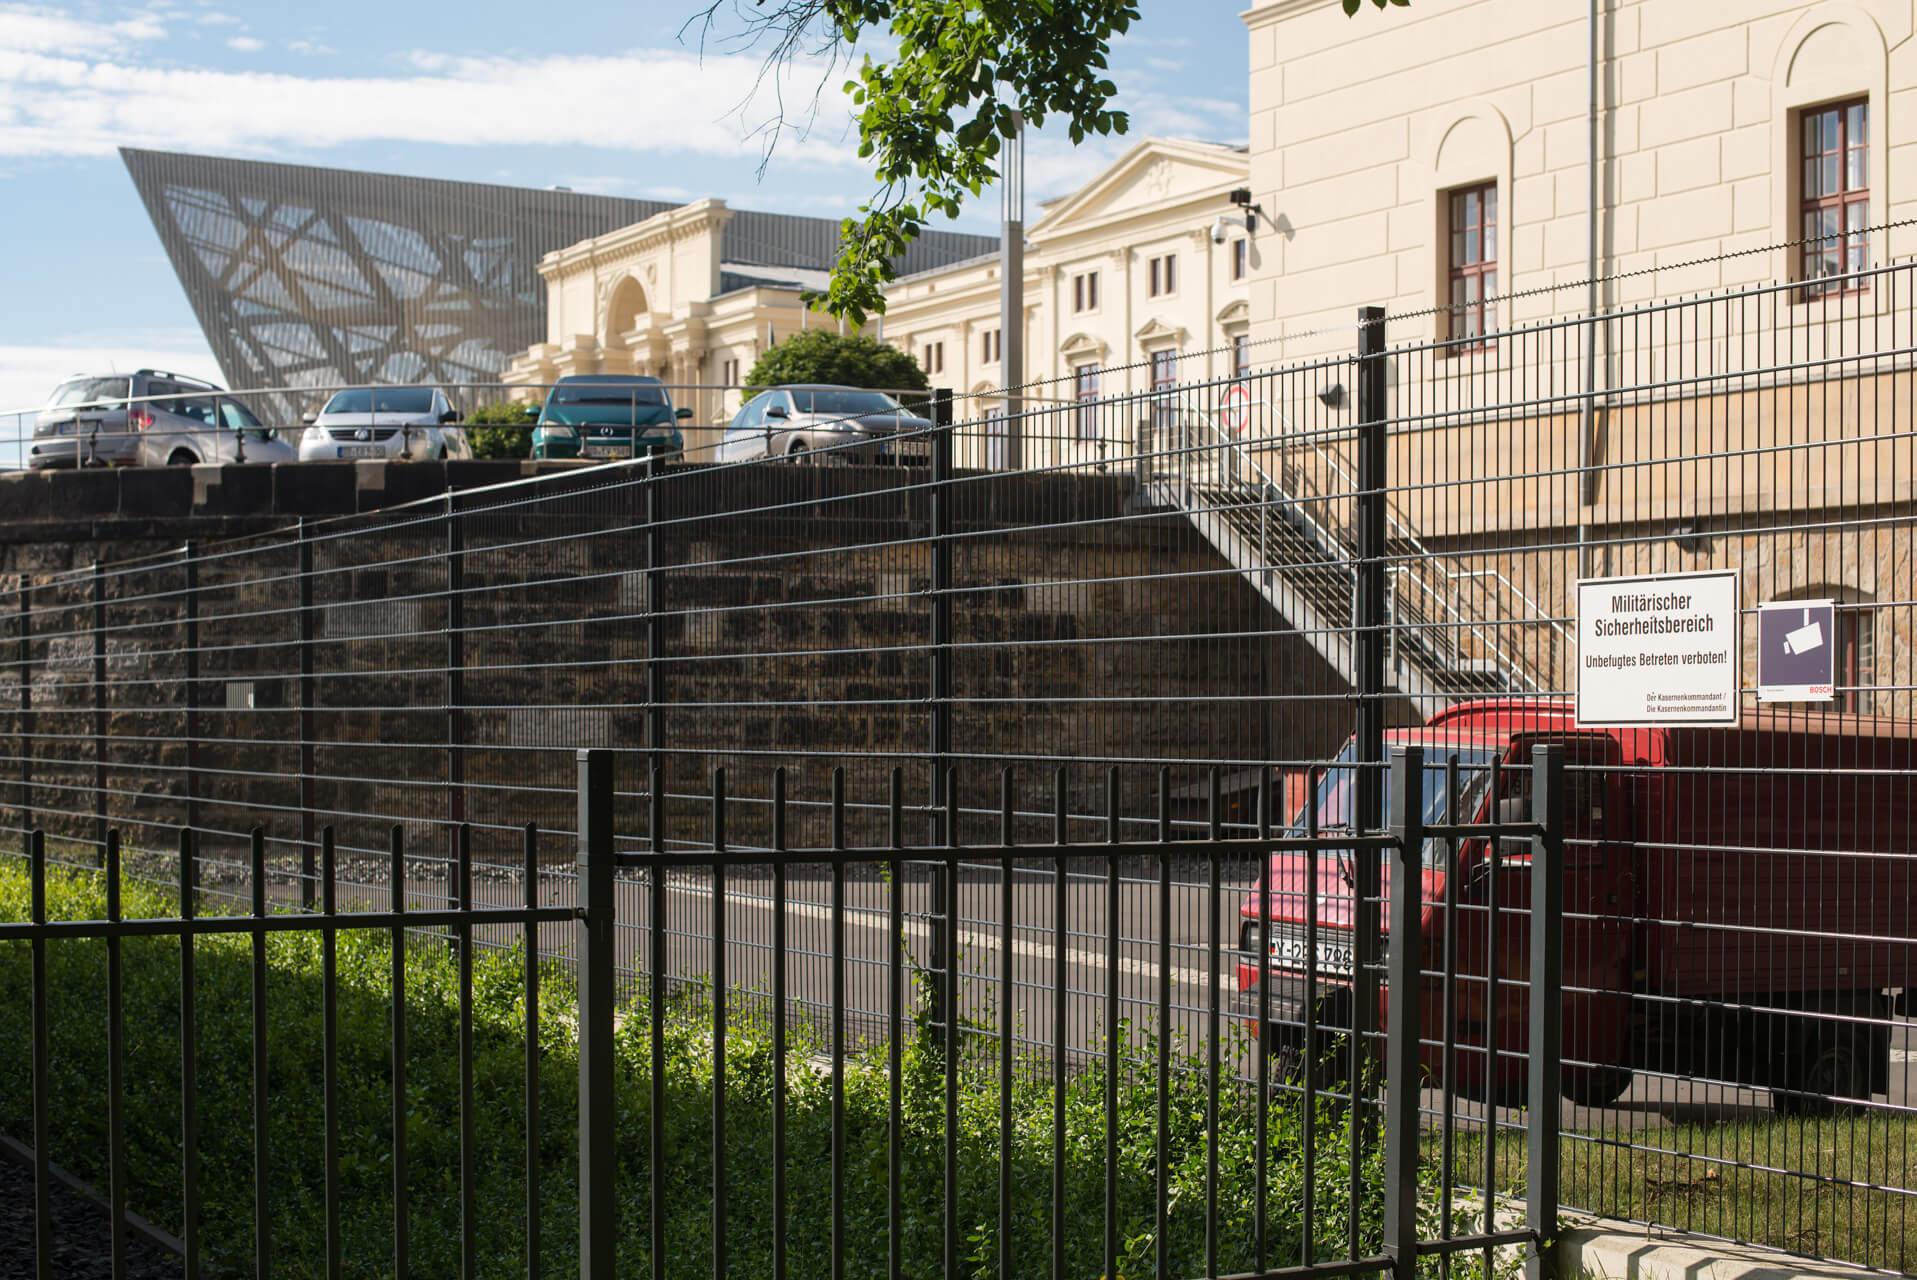 Dresden Albertstadt Militärhistorisches Museum; Fotograf Steffen Lohse